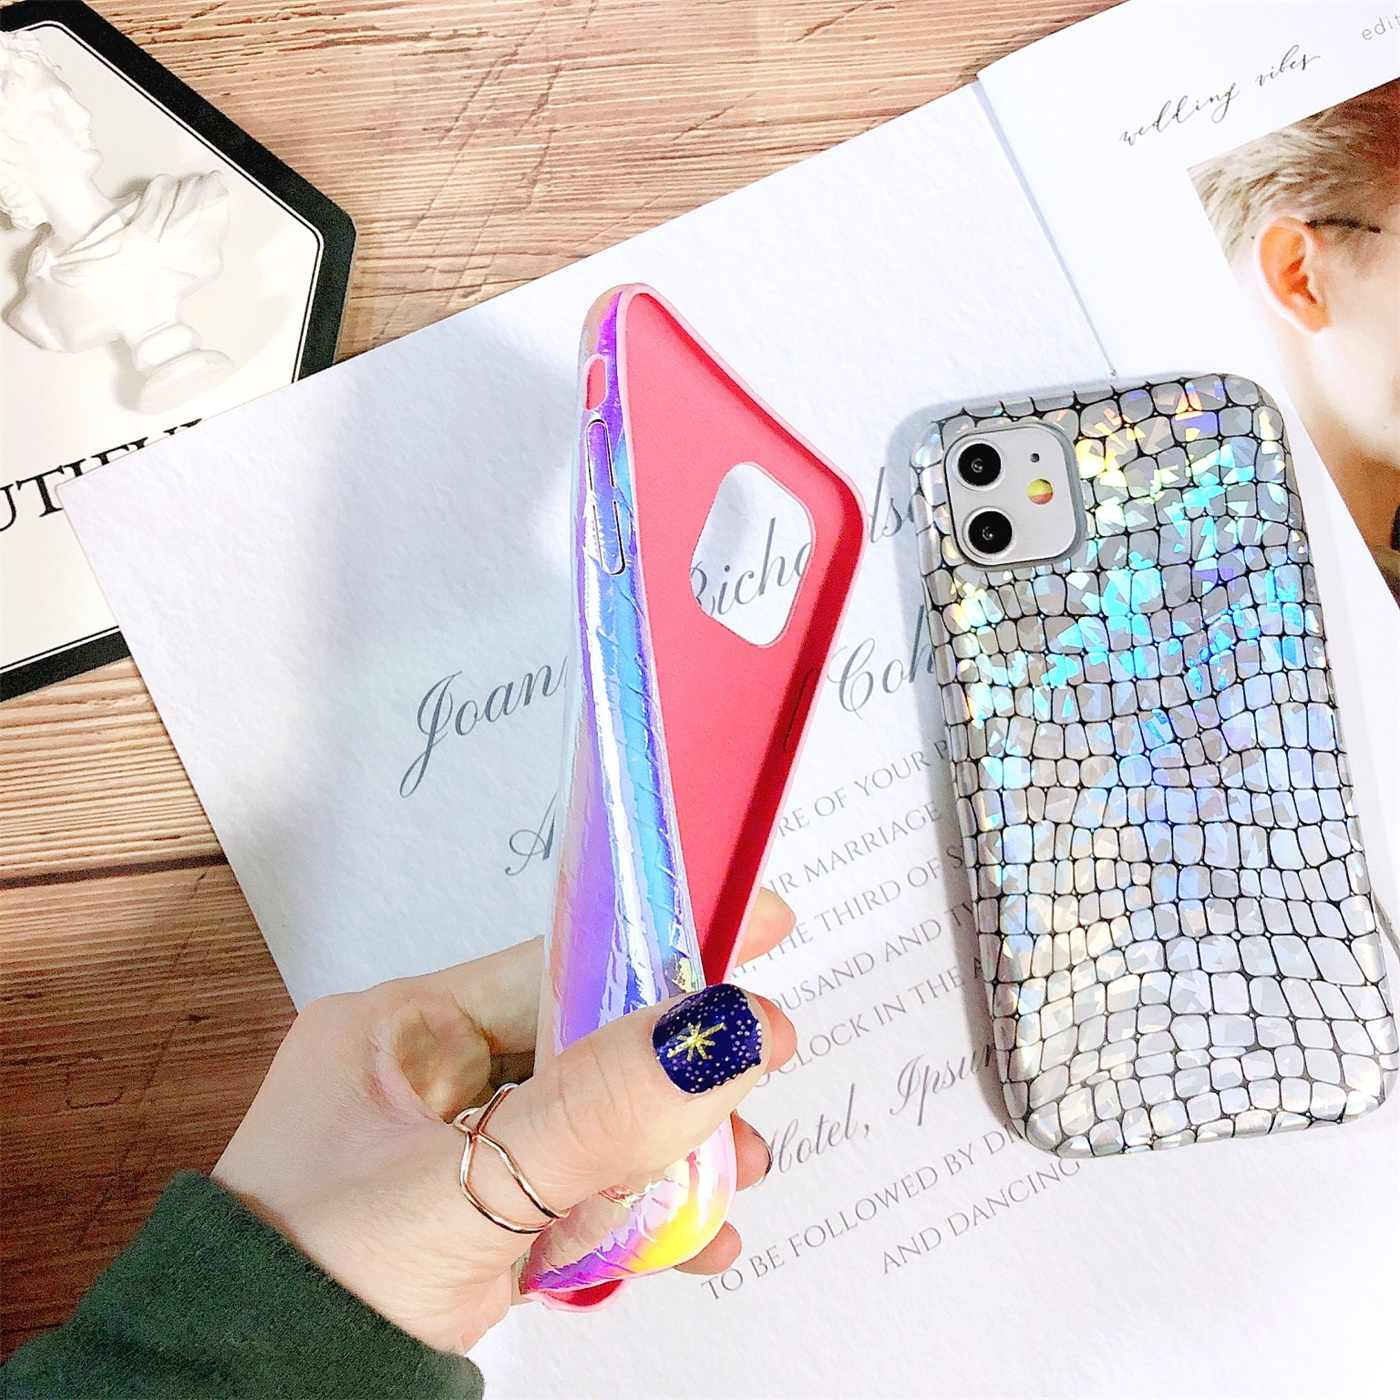 Liscn Cao Cấp Ốp Lưng Điện Thoại Iphone XS Max 6 6Splus 7 X XS XR 11 Pro Max Da Cá Sấu da PU Điện Thoại 8Plus Ốp Lưng